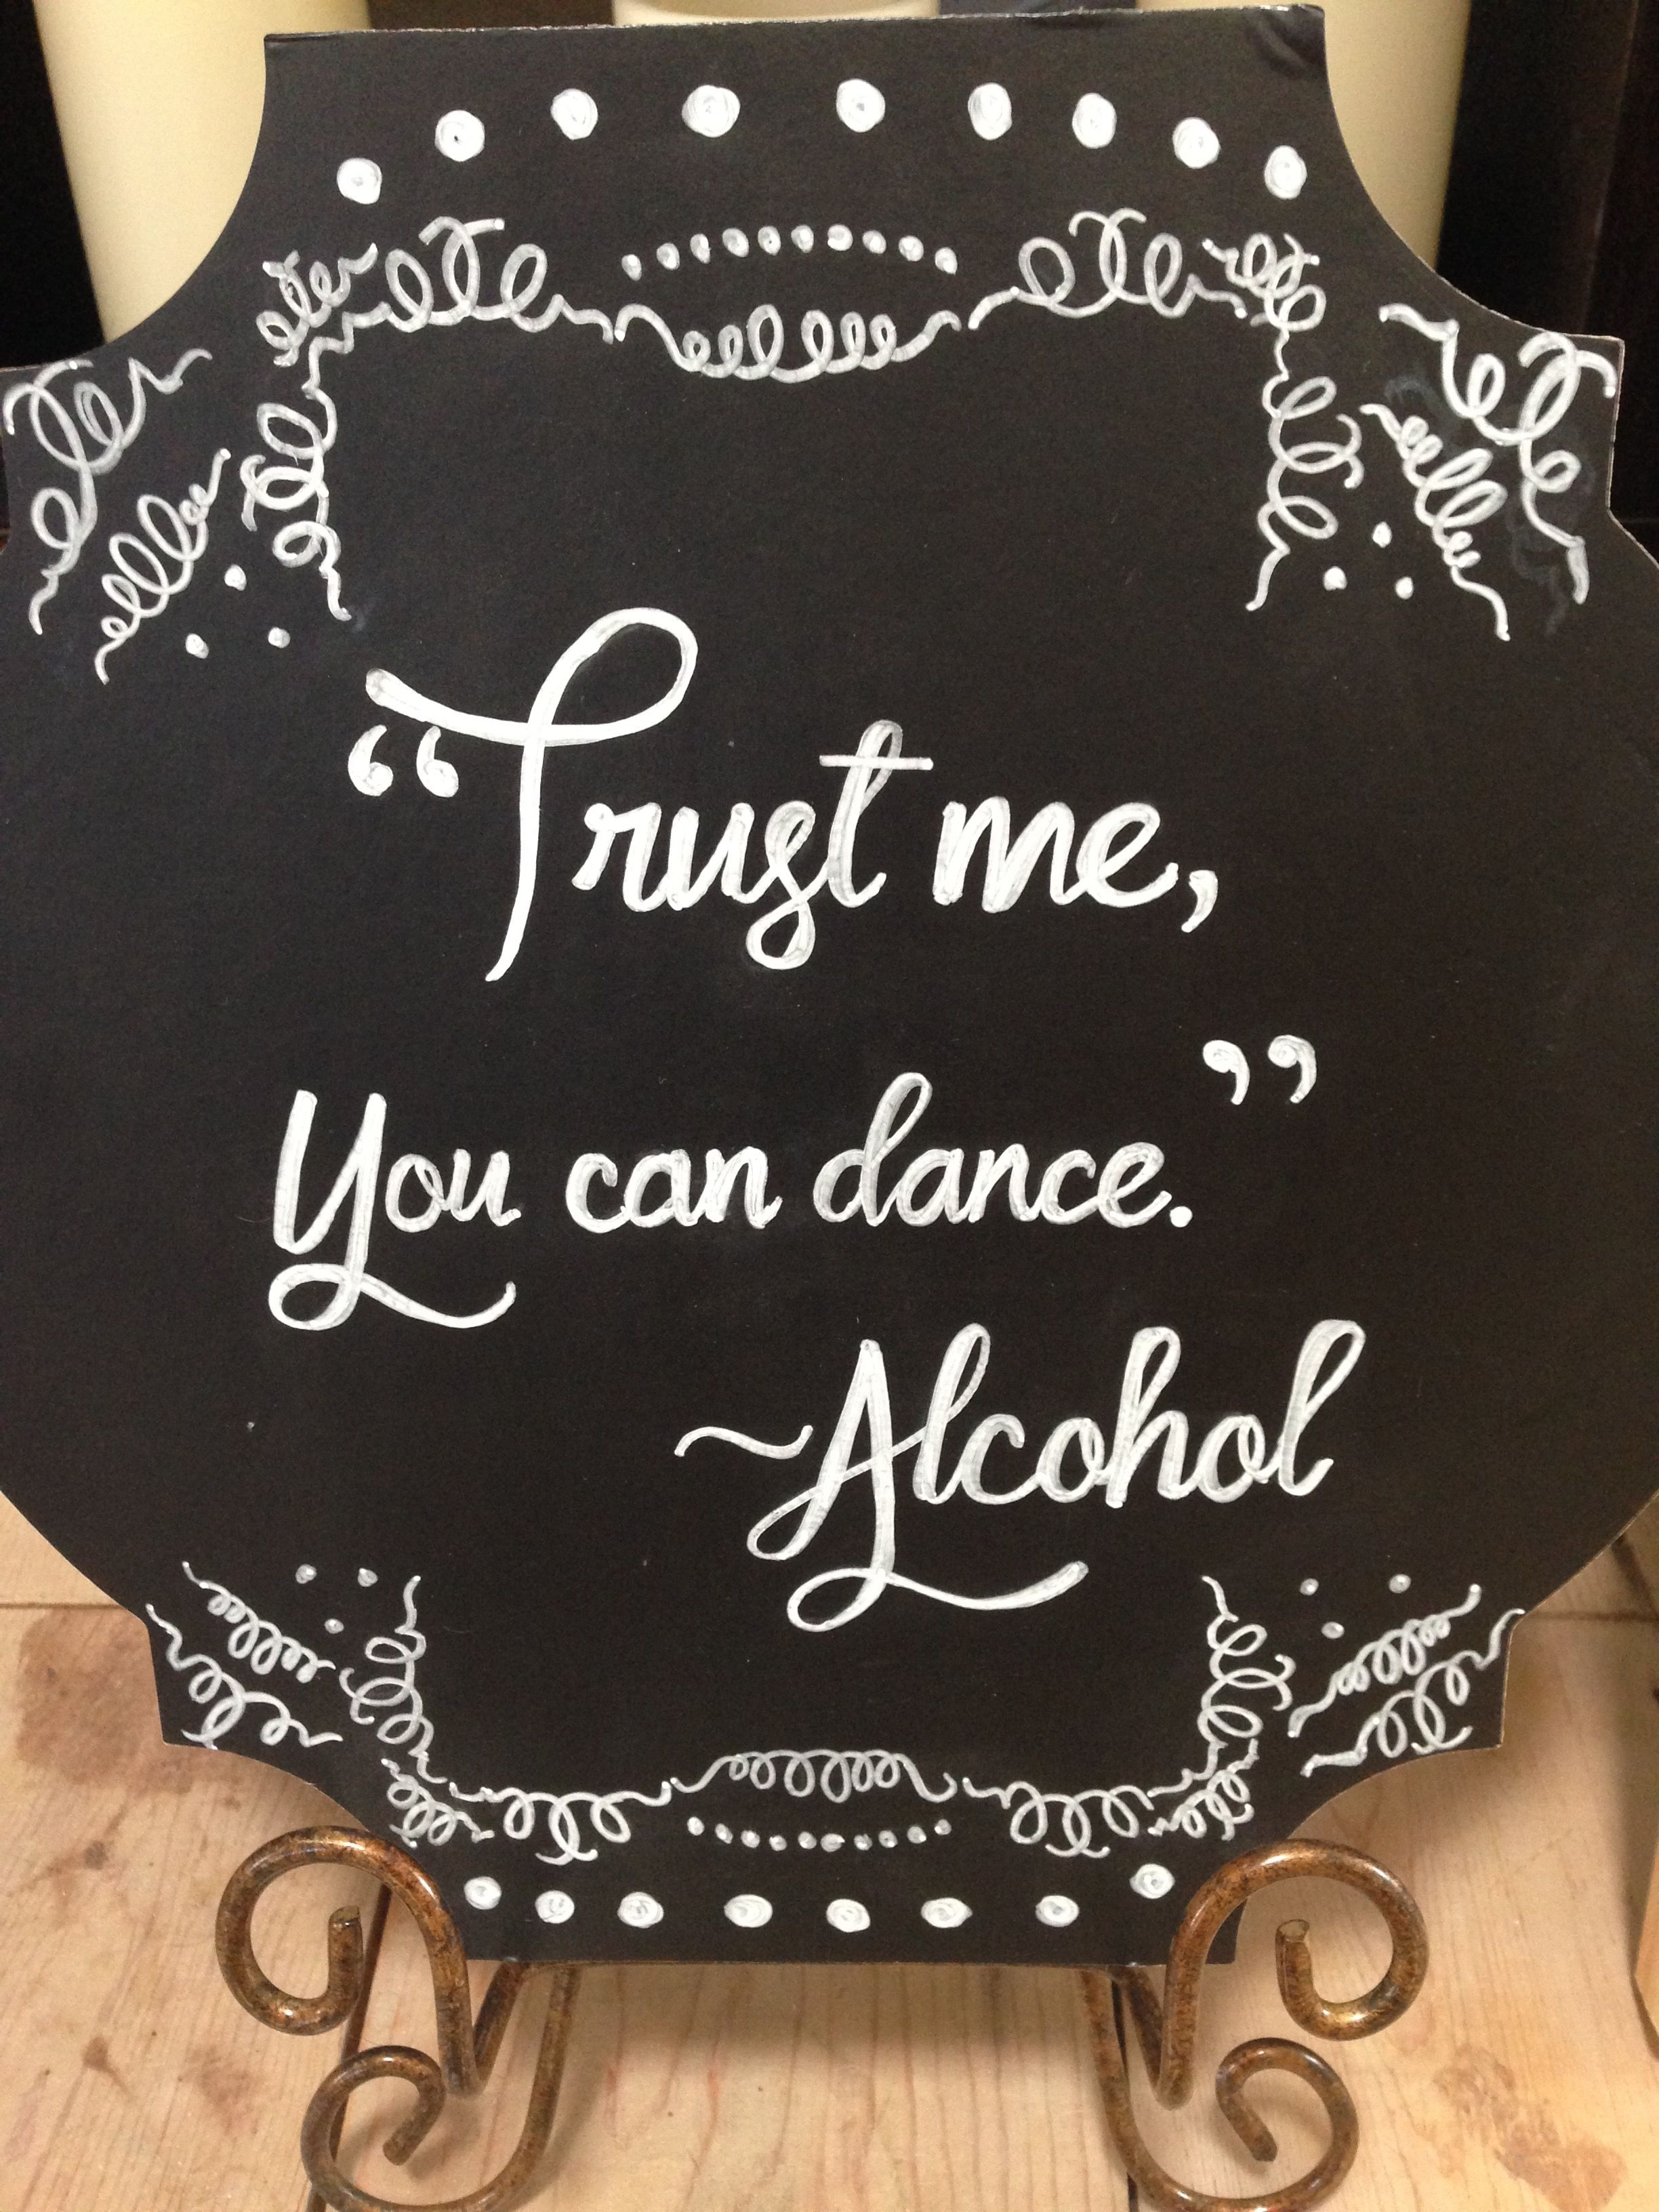 Bar sign for wedding reception. Dance chalk board sign.